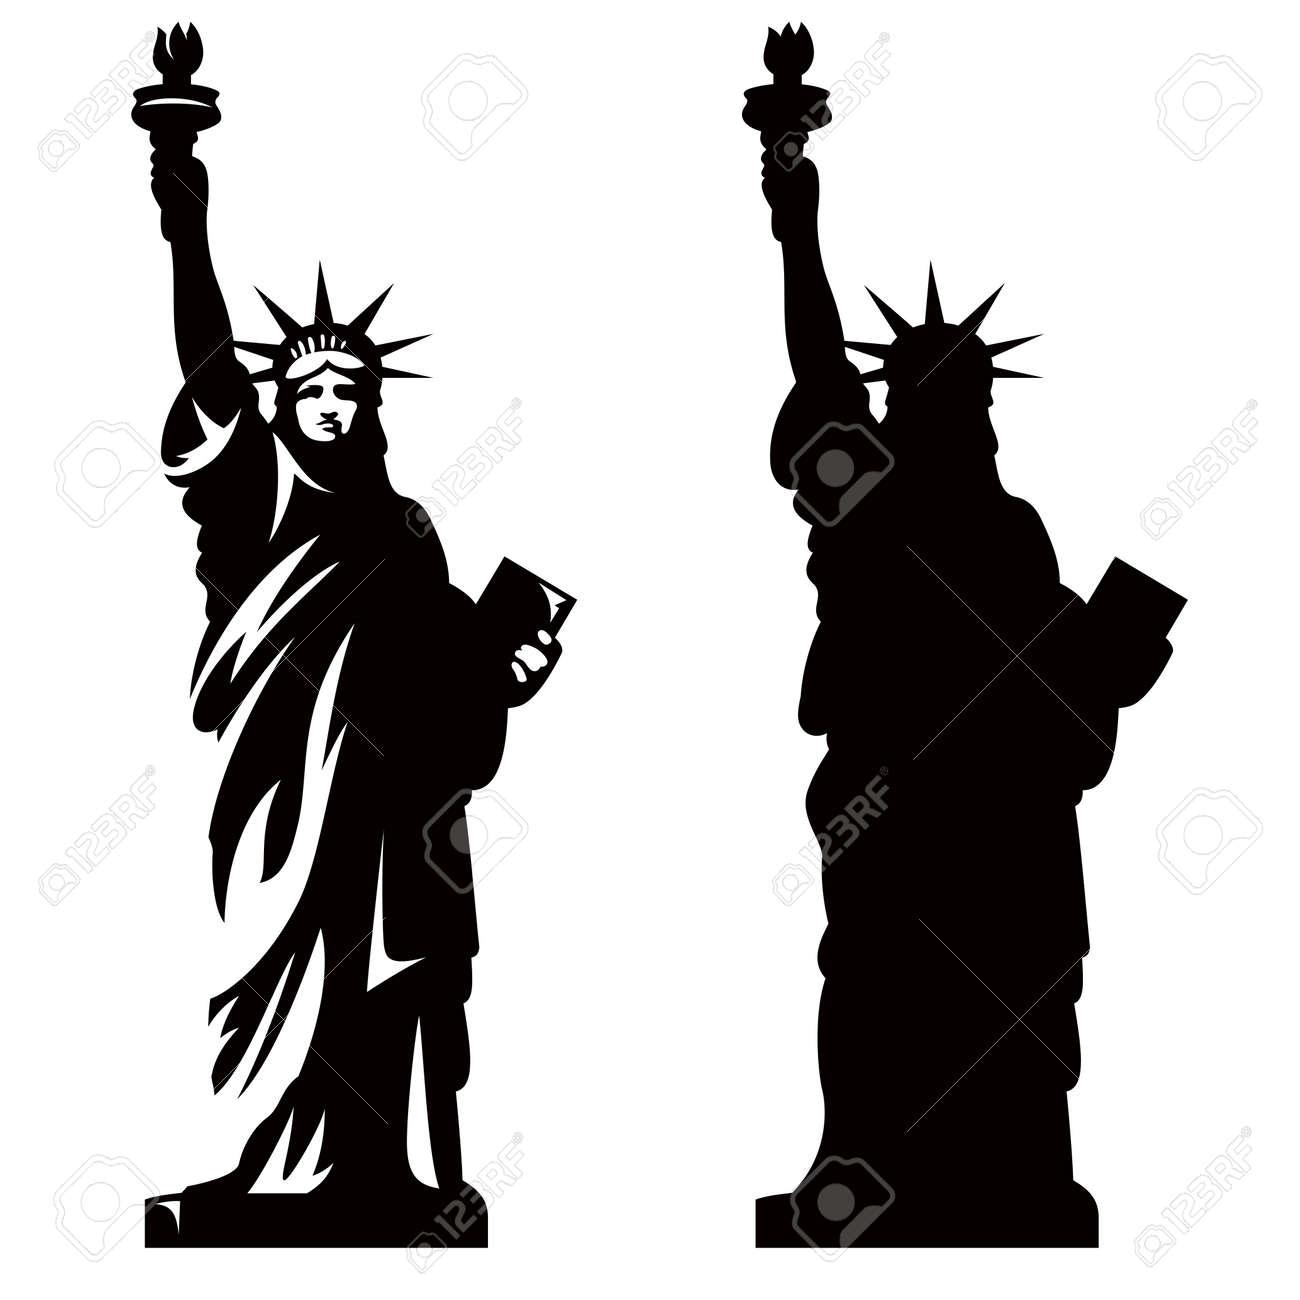 Statue of Liberty. New York landmark. American symbol. Vector silhouette - 36804879